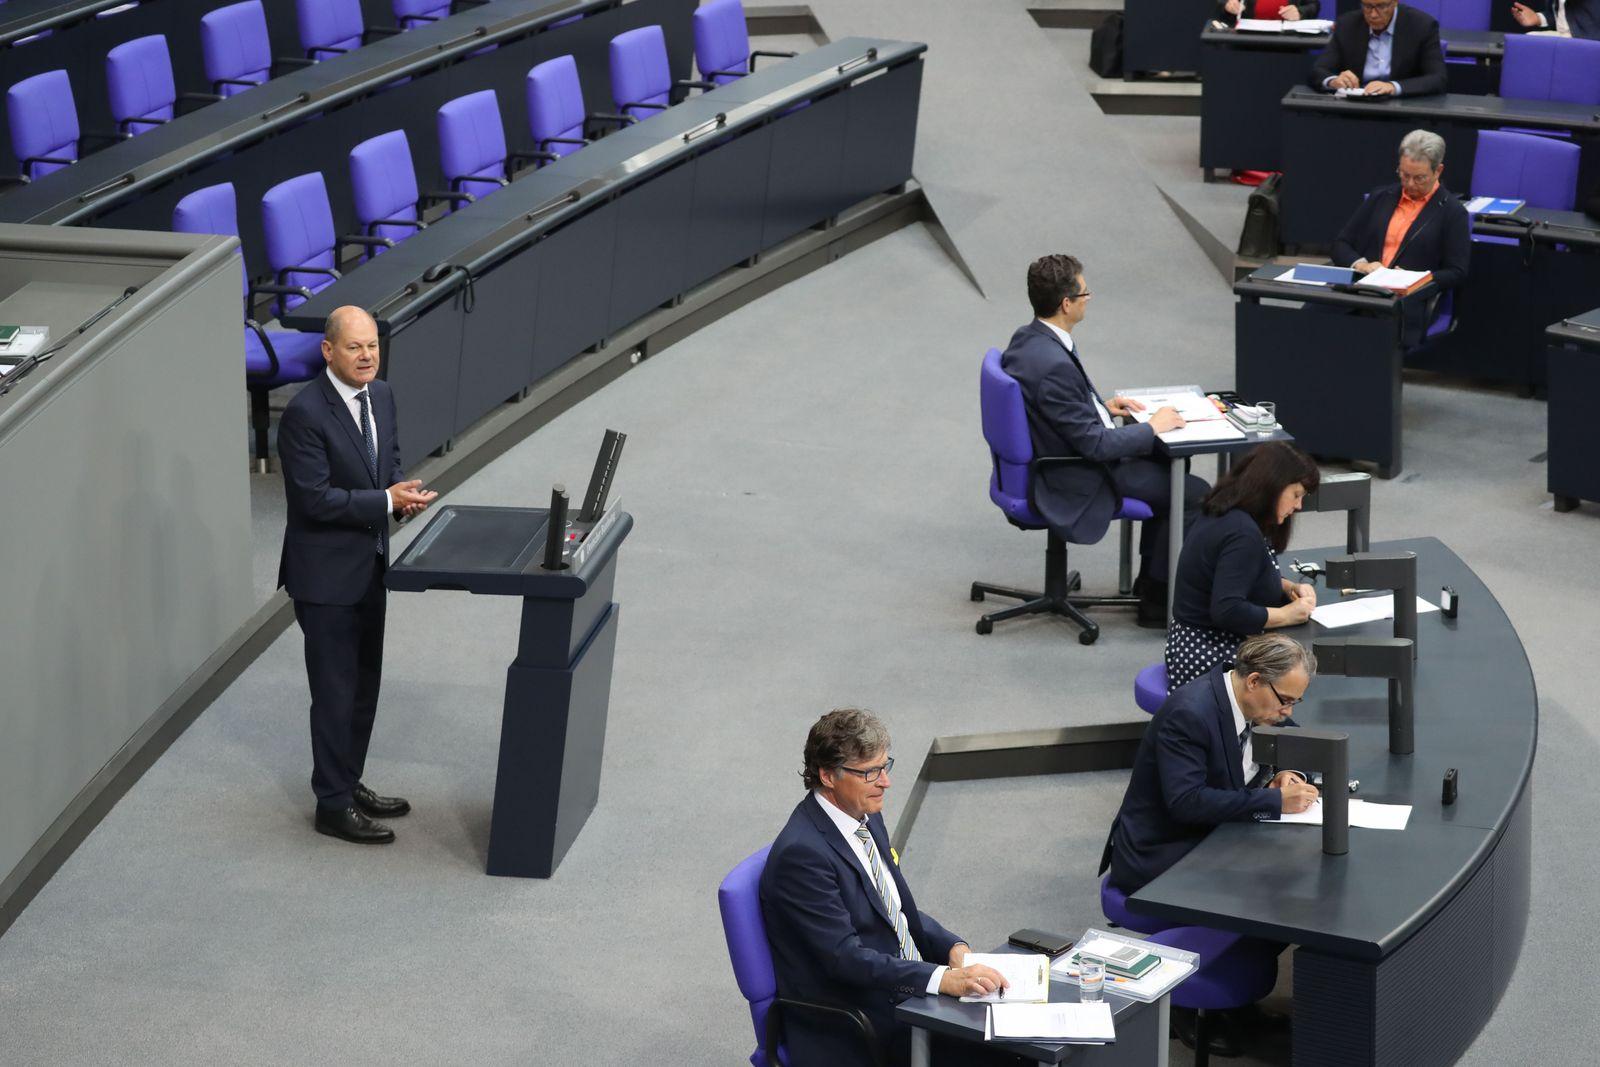 German Bundestag debates on Corona stimulus and crisis management package, Berlin, Germany - 02 Jul 2020